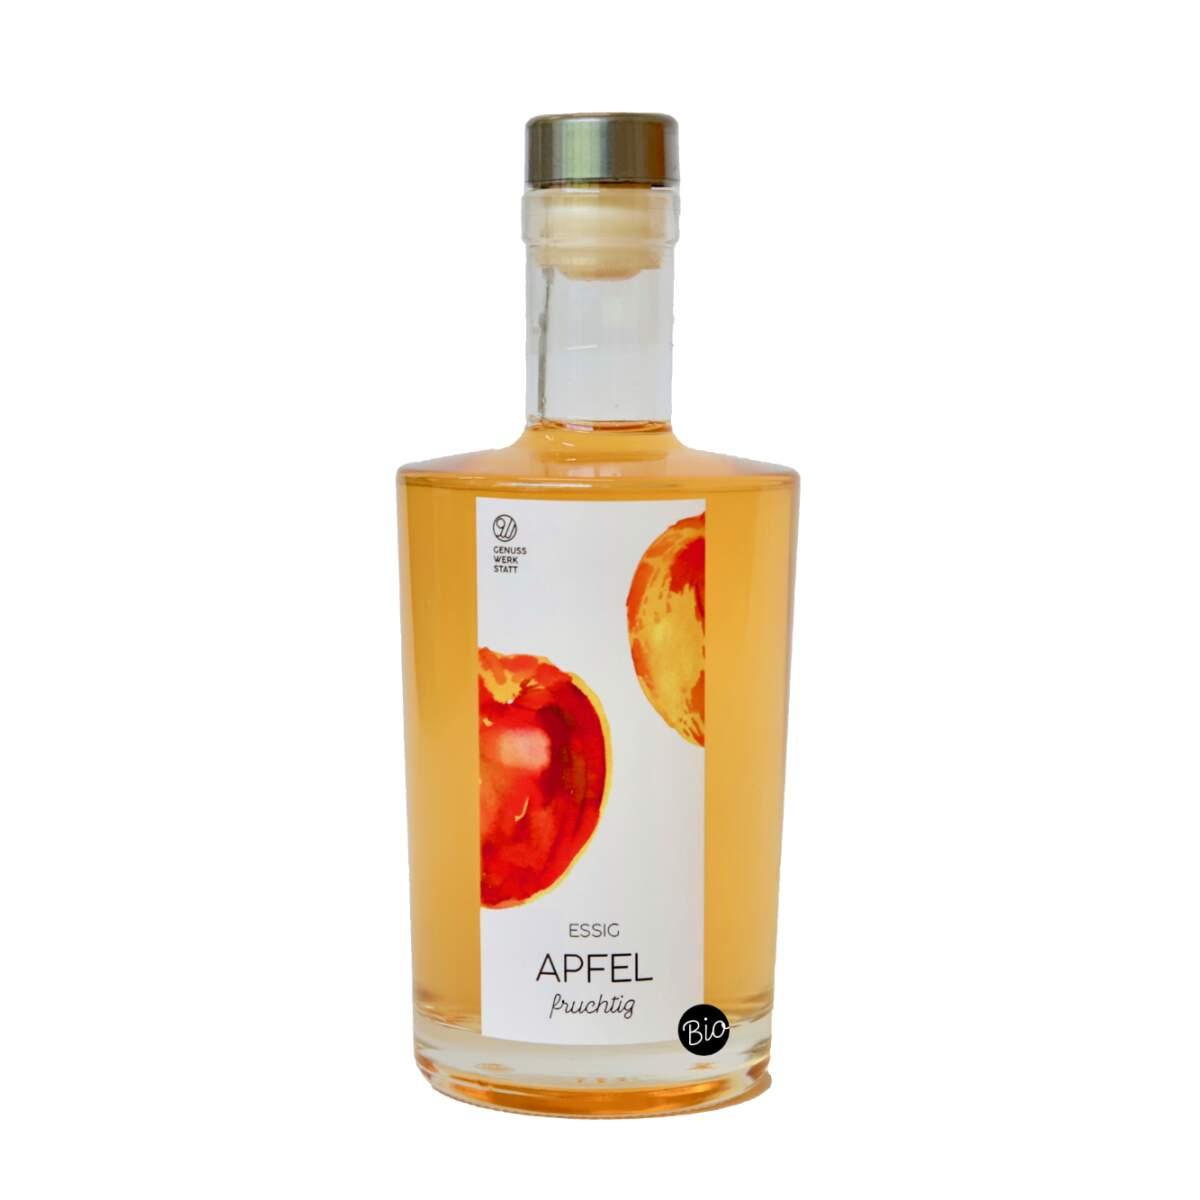 Flasche-Essig-Apfel_Bio_0988_1000px5wFsUVla49ARw